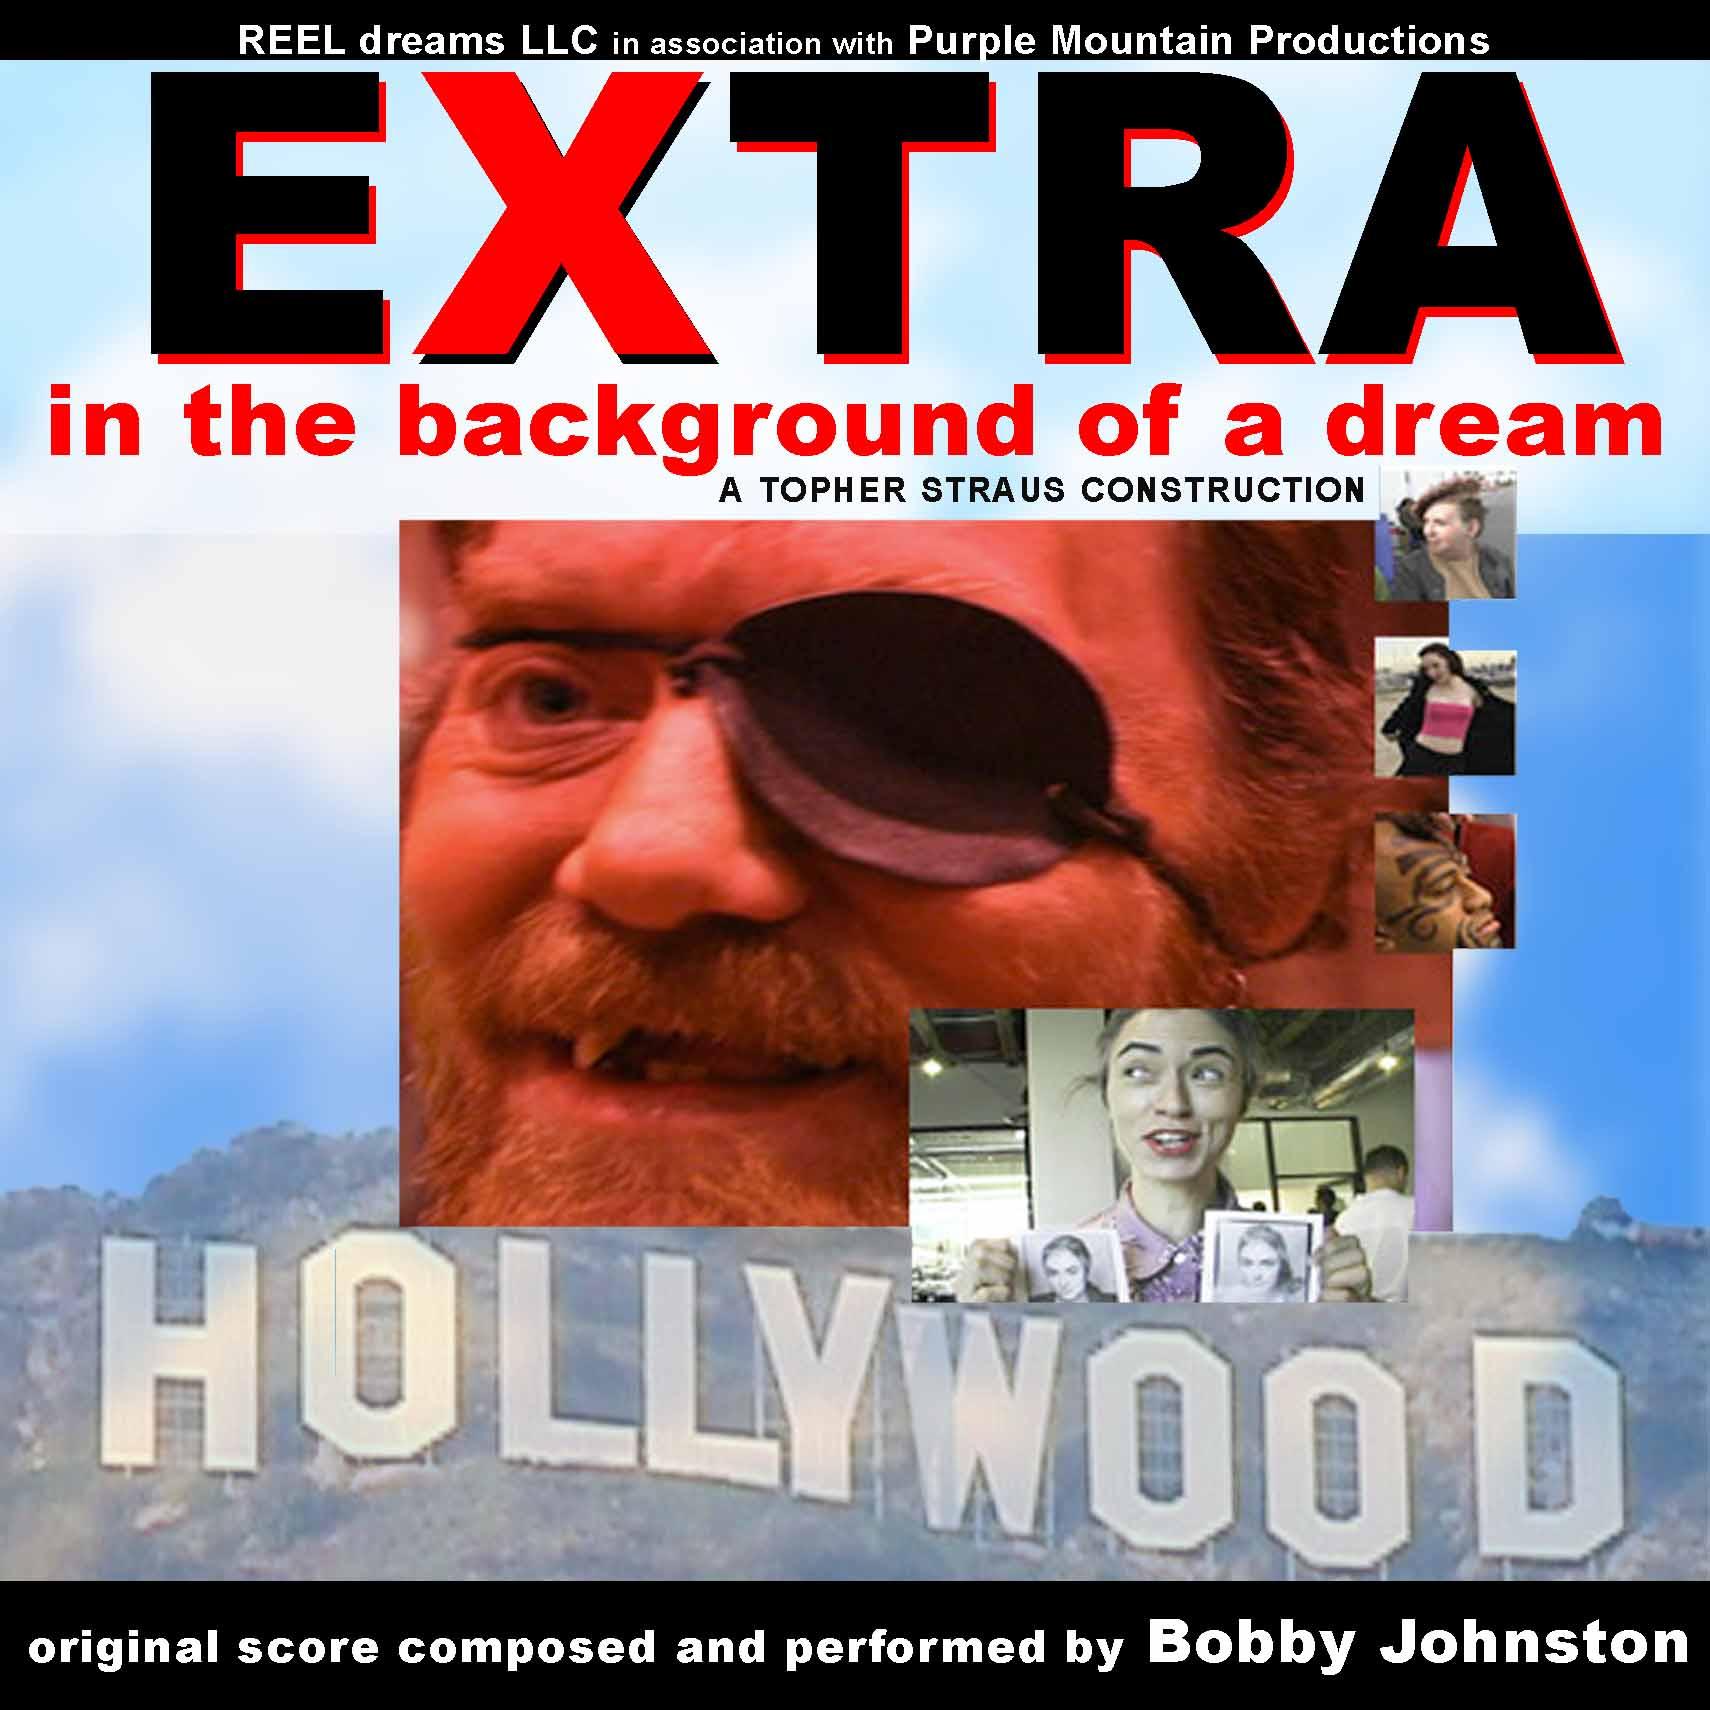 cd cover front.jpg